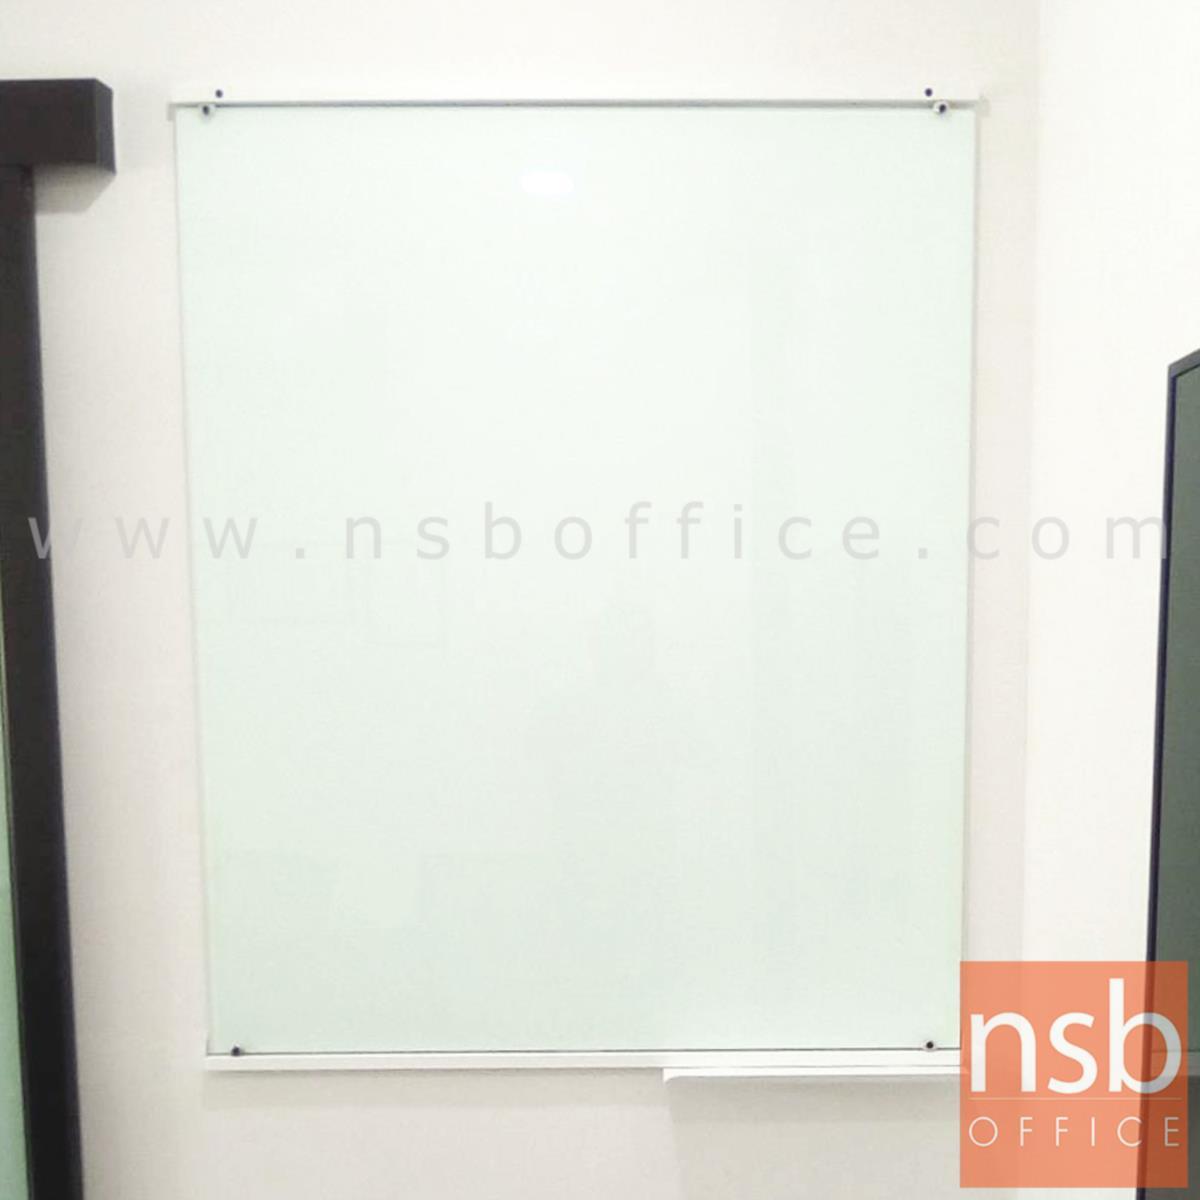 G01A065:ไวท์บอร์ดกระจกนิรภัยสีขาว   ขนาด 100W*(150H,180H,200H cm.)